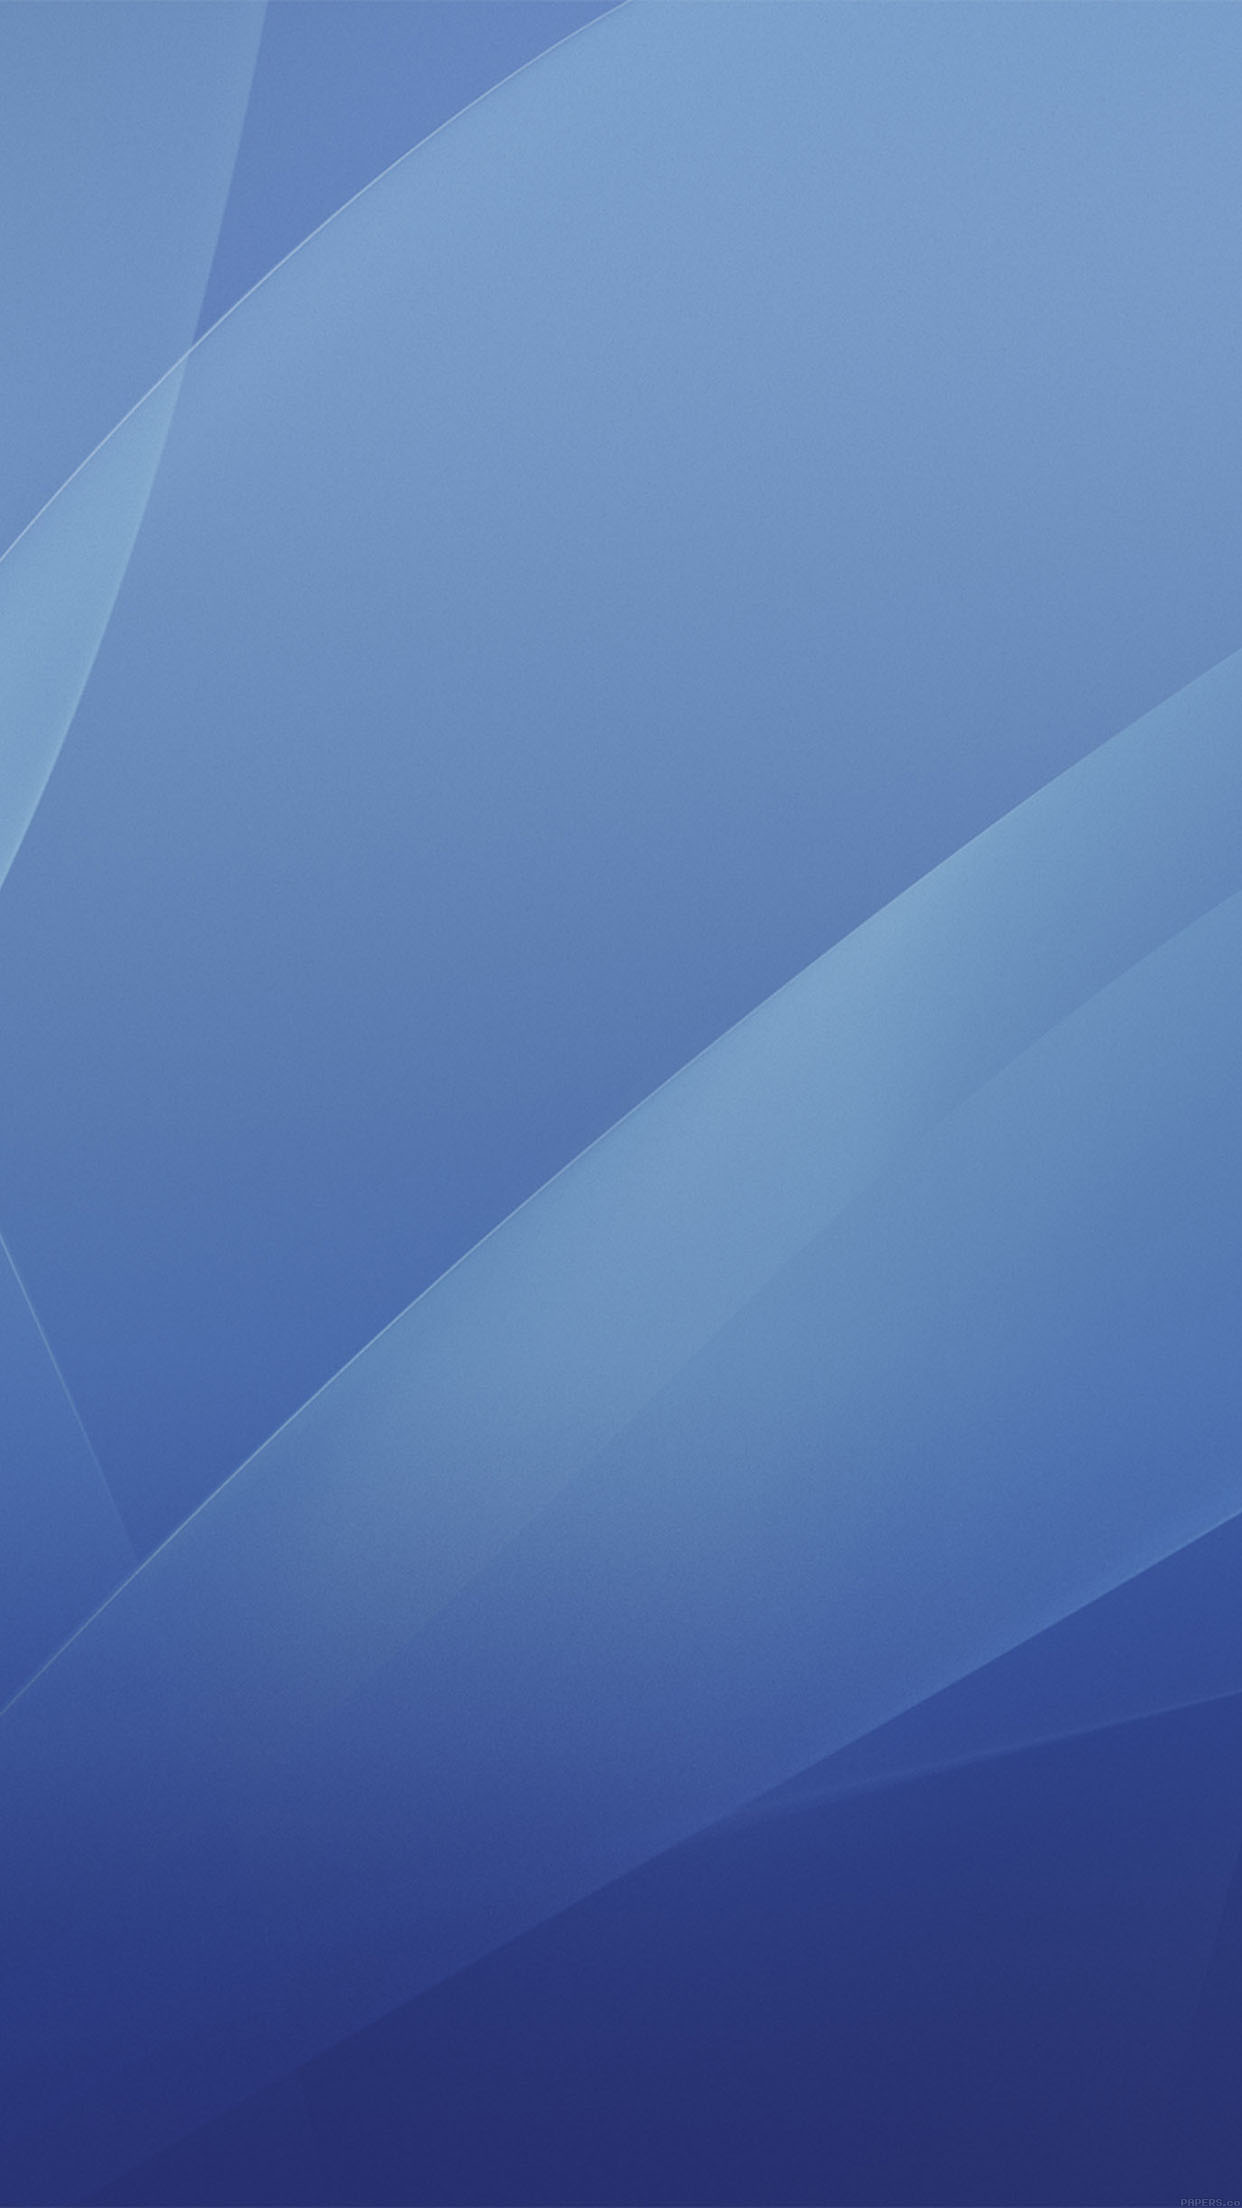 Iphone7papers Vb53 Wallpaper Aqua Blue Pattern